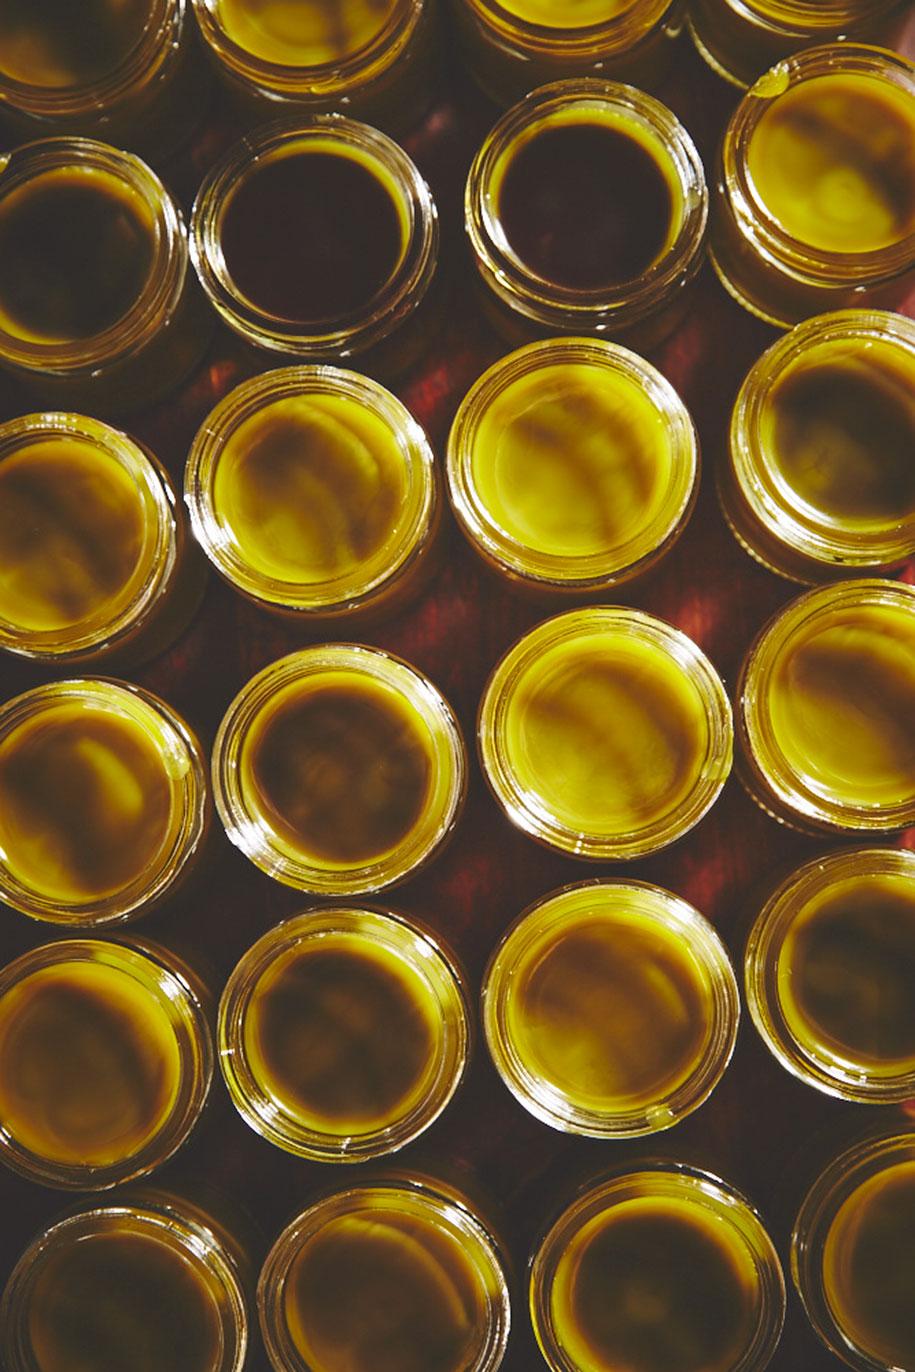 marijuana-horticulture-sisters-of-the-valley-shaughn-crawford-john-dubois-17